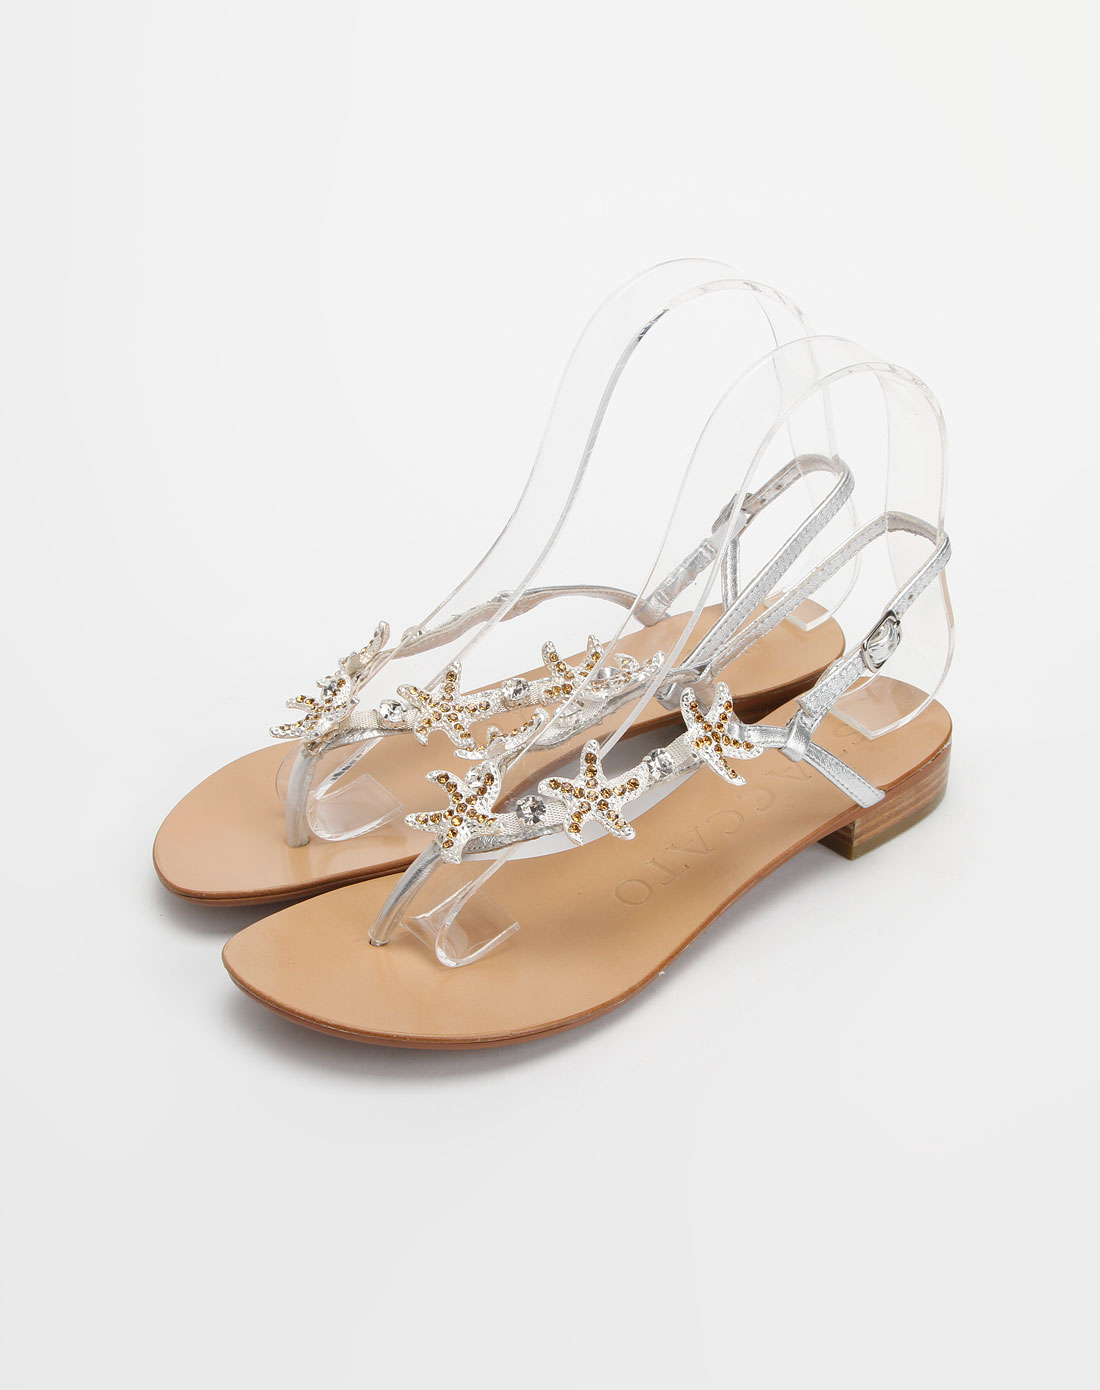 思加图staccato银色贴膜绵羊皮平底凉鞋